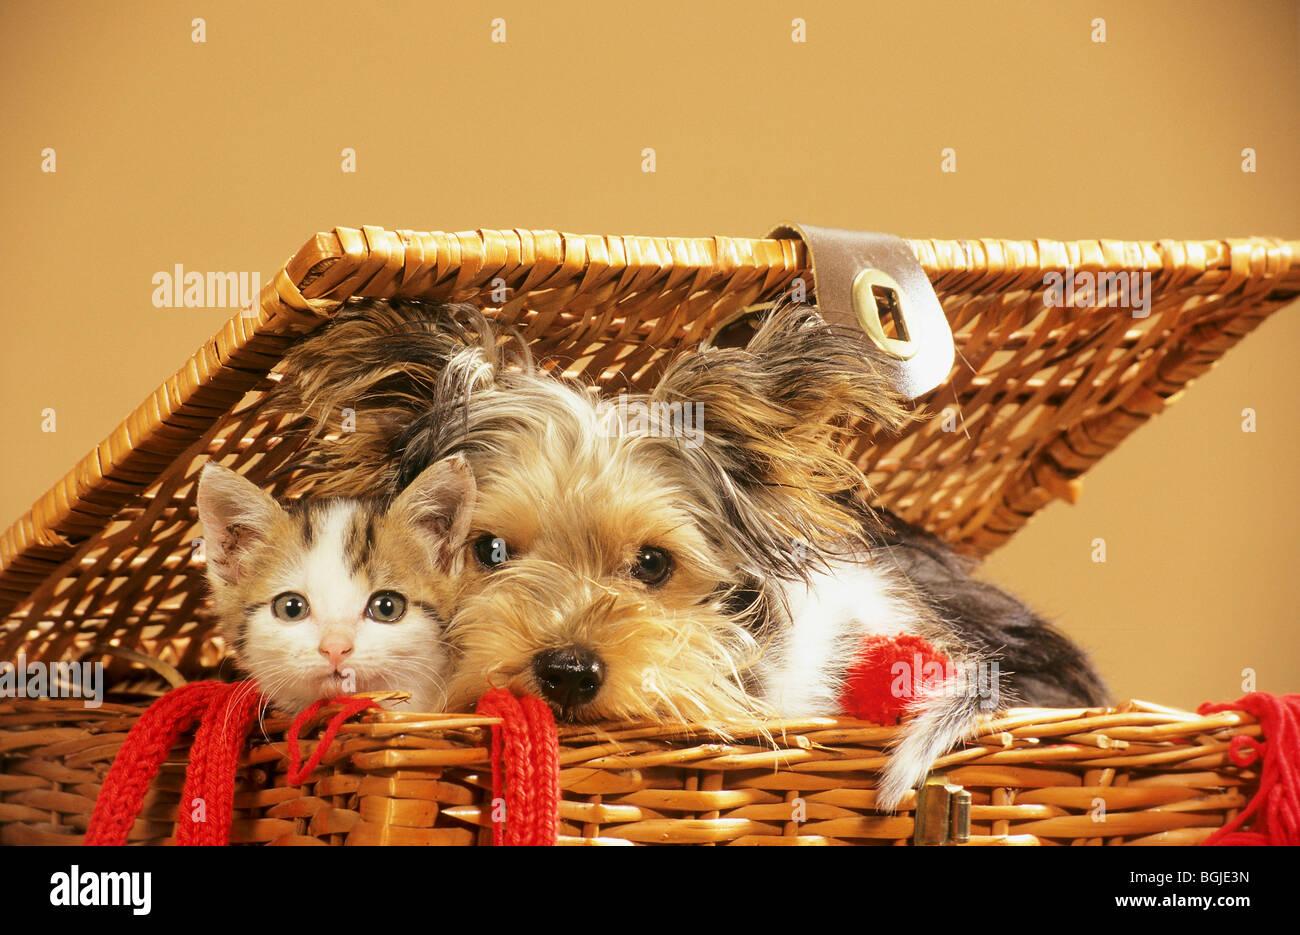 animal friendship Yorkshire Terrier dog and kitten in basket